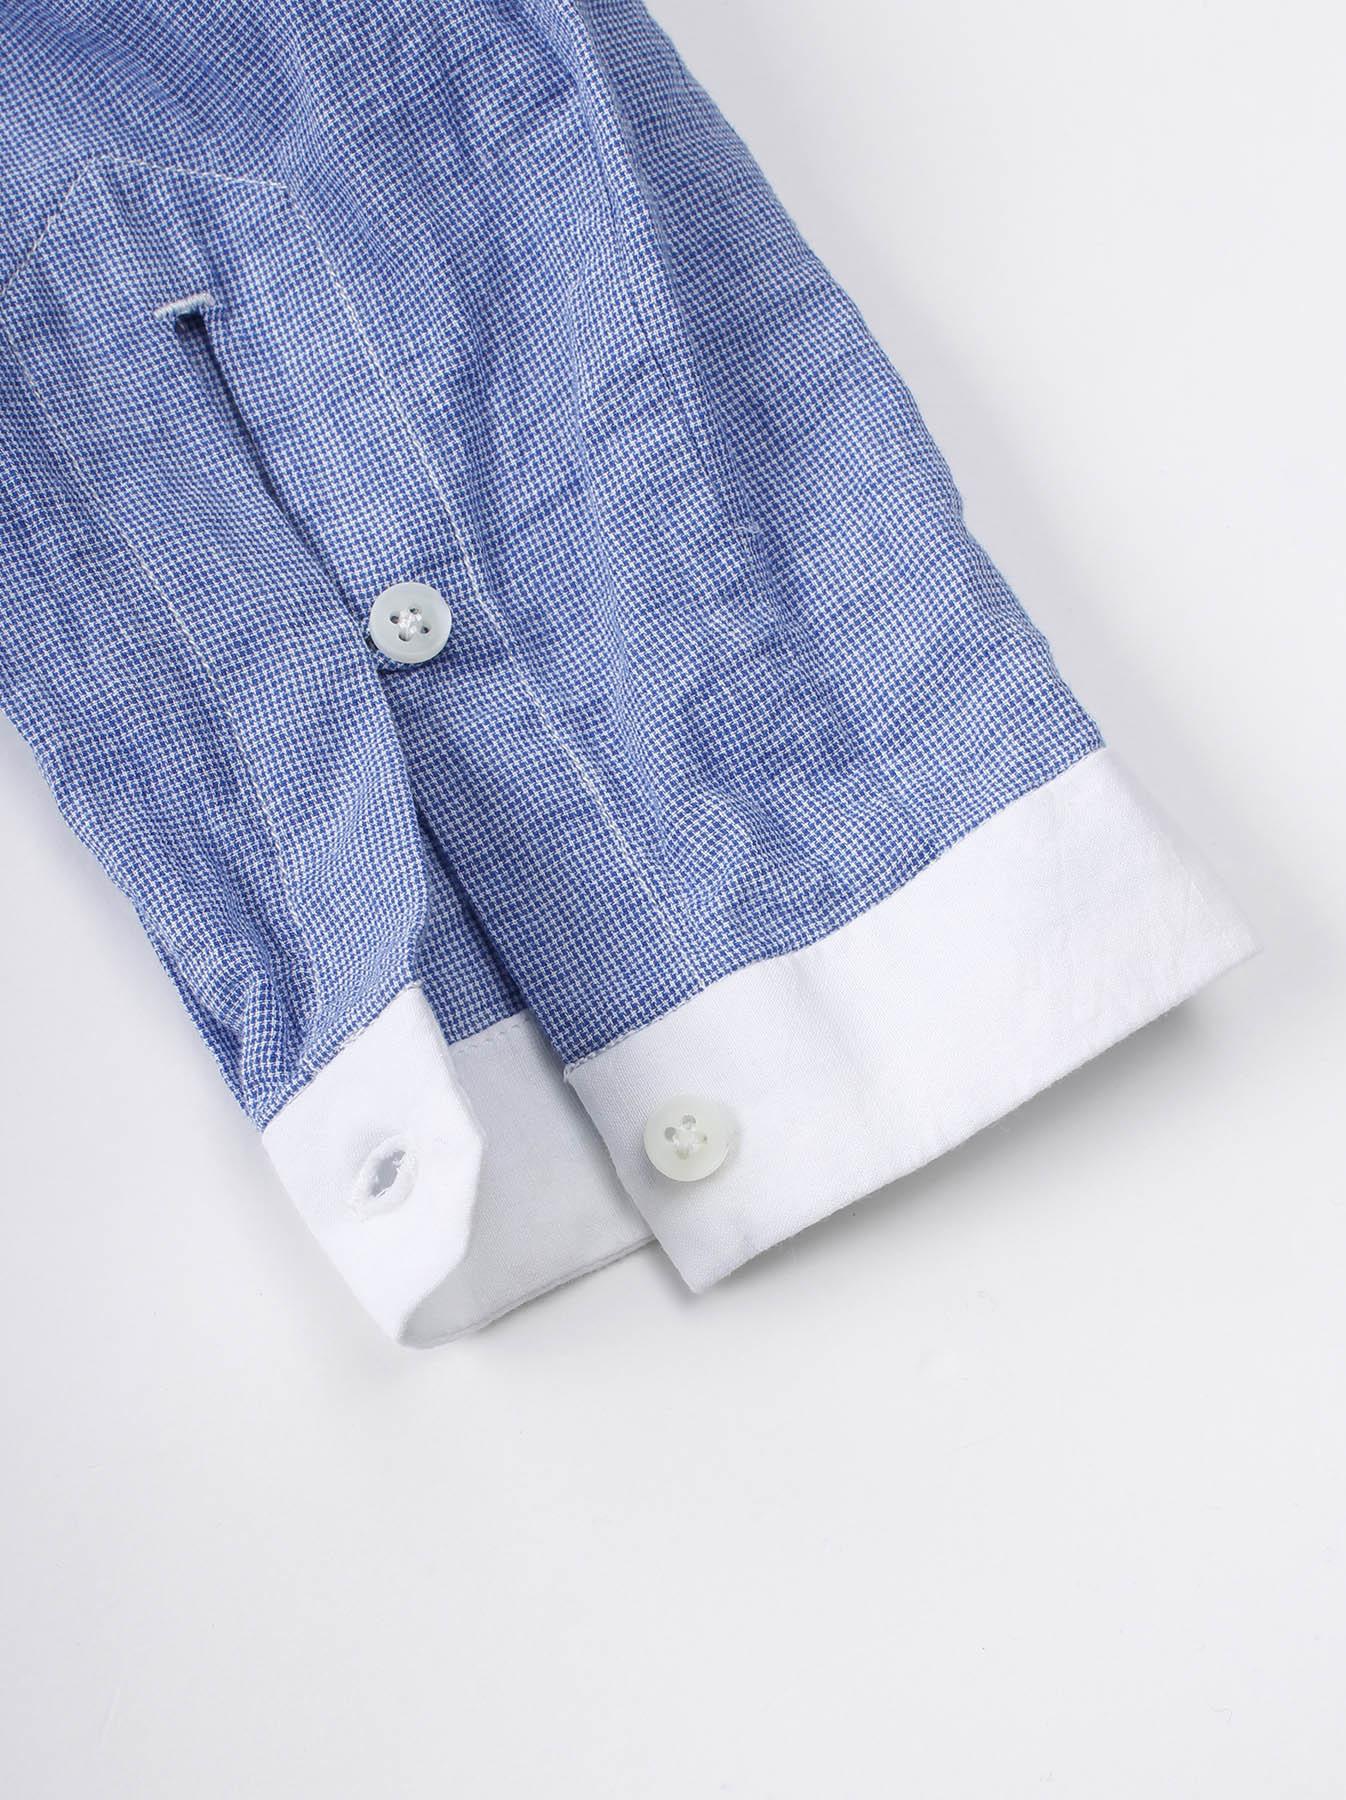 WH Mix Ai-kaze Khadi Pullover Shirt-5